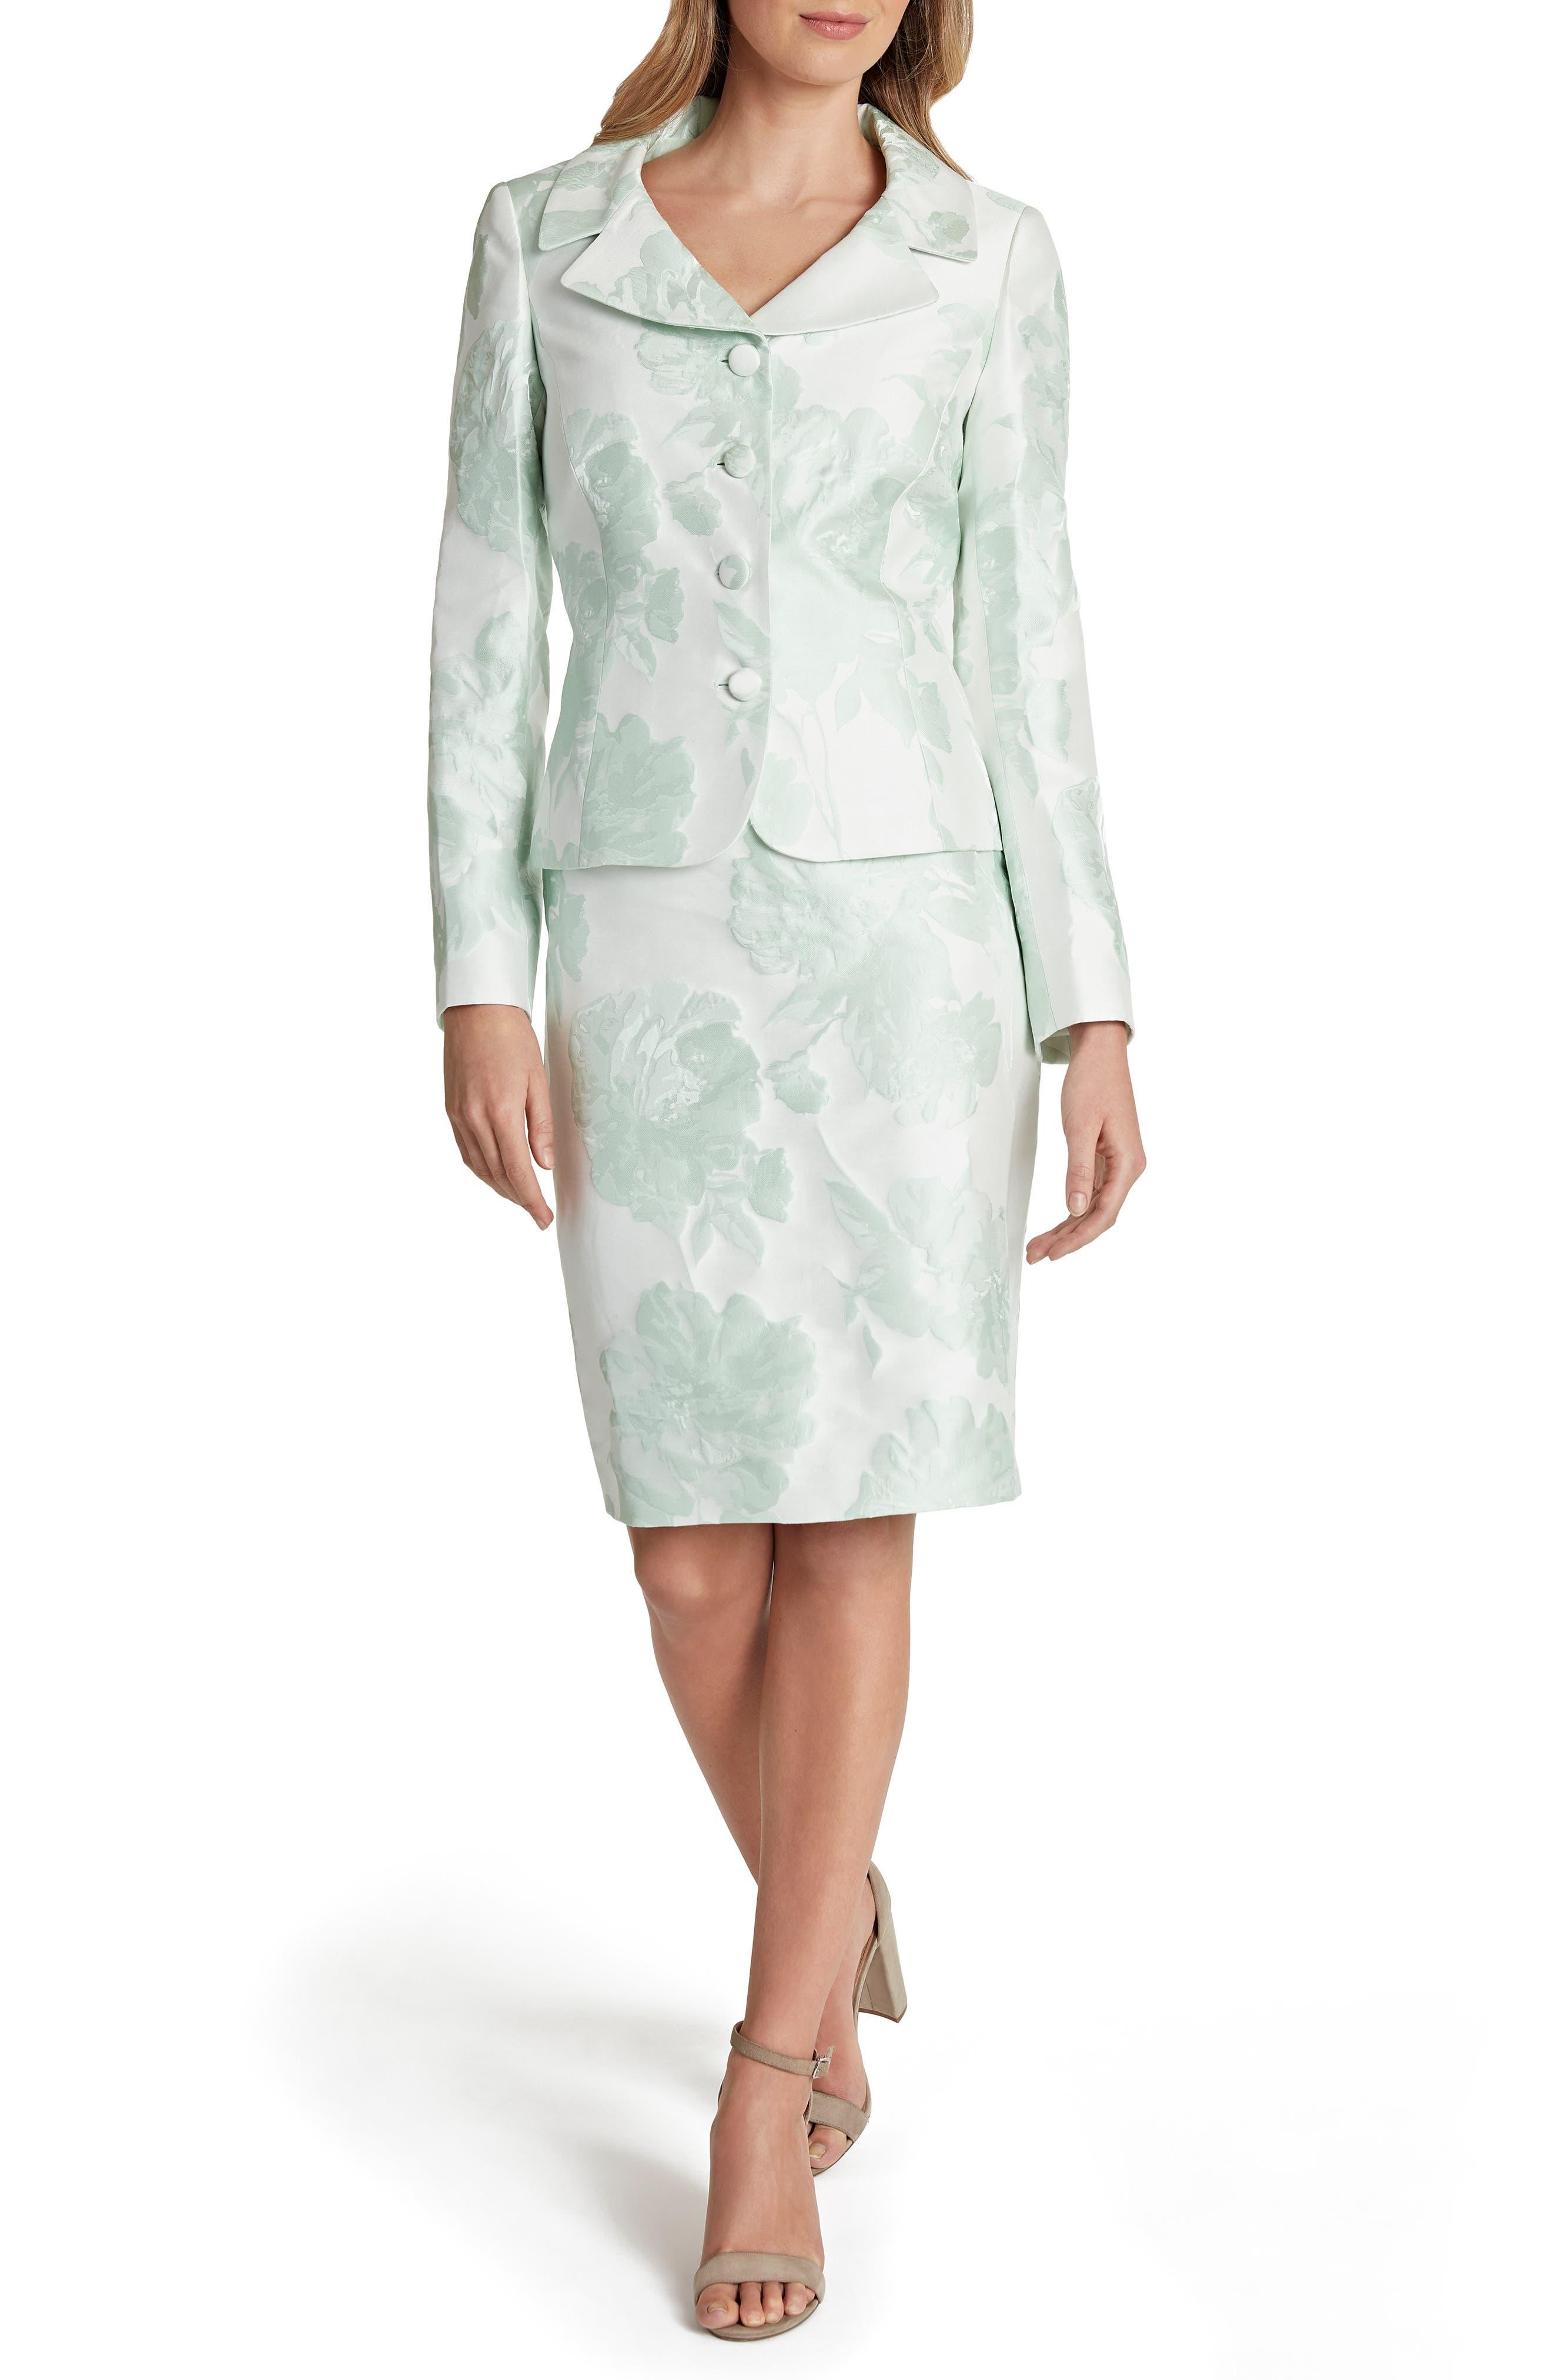 Tahari Floral Jacquard Suit